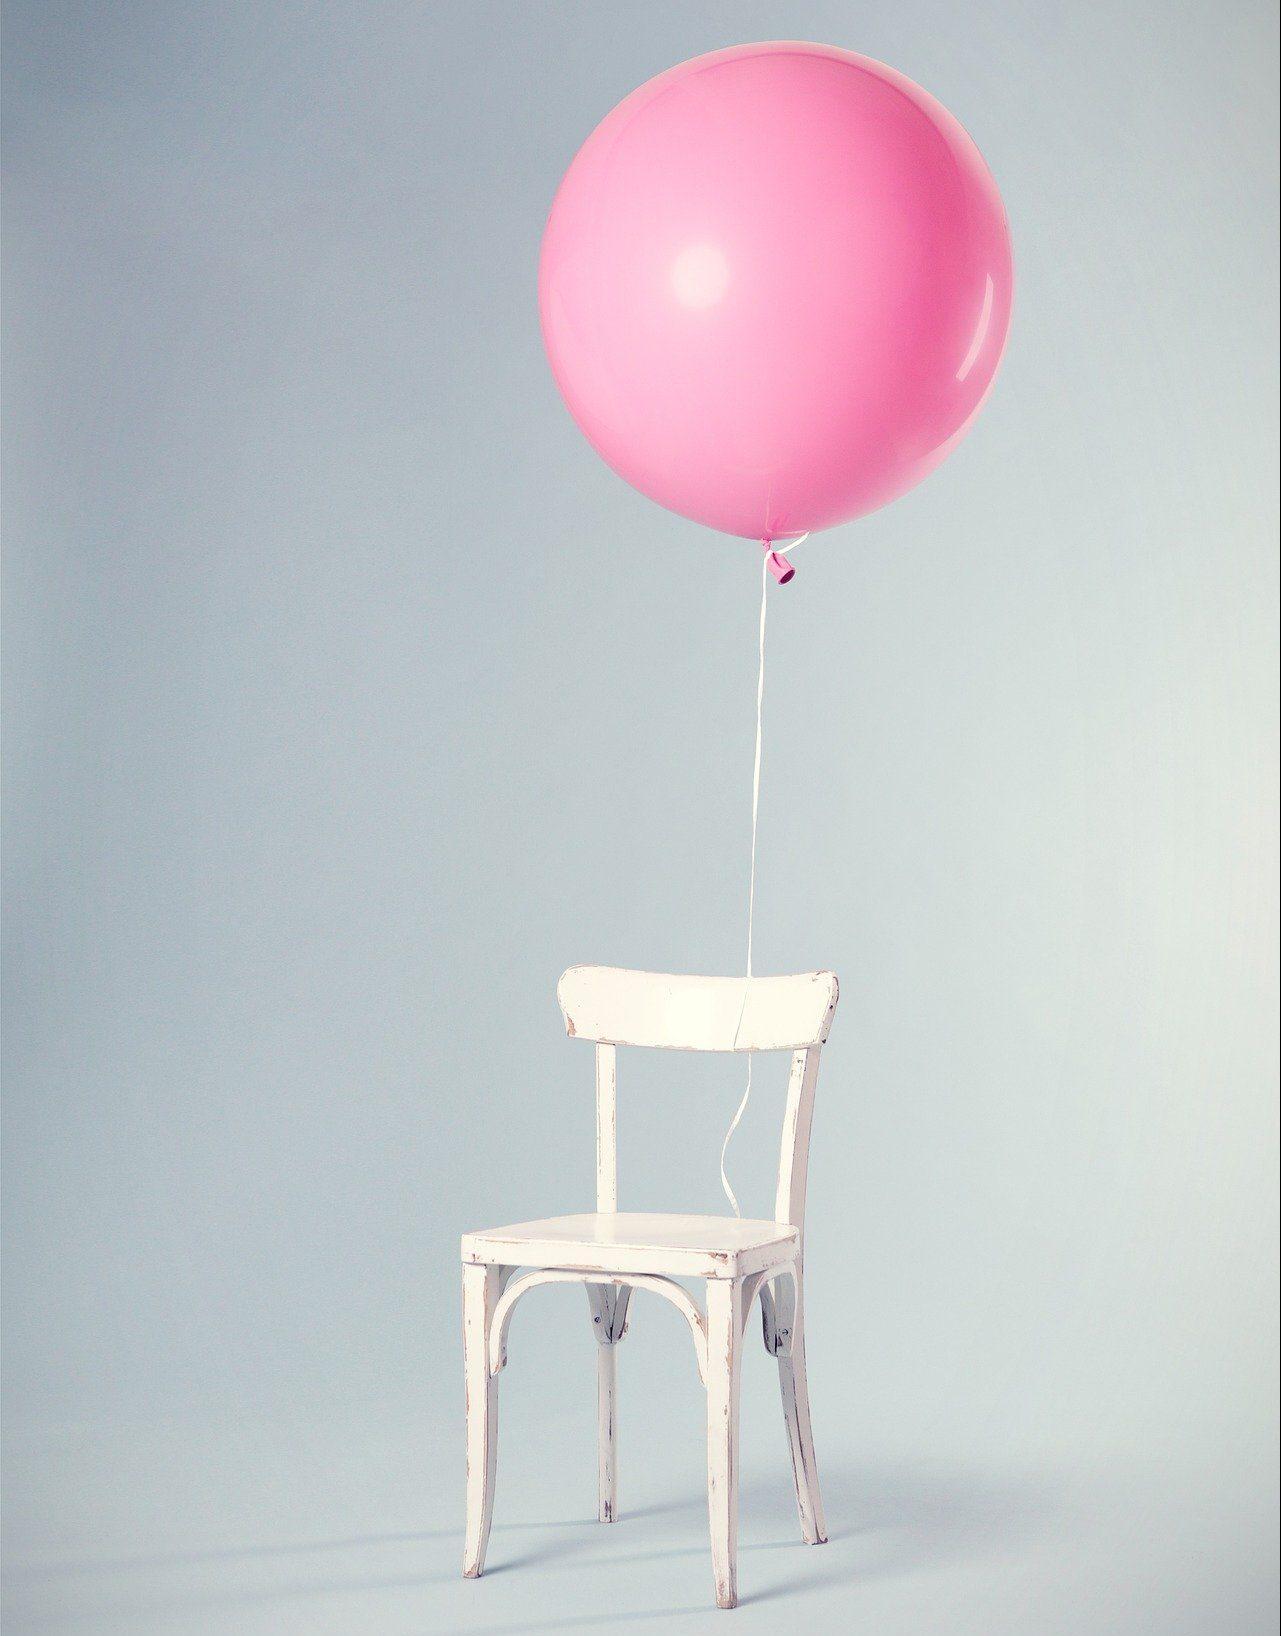 alquiler de sillas plegables para eventos